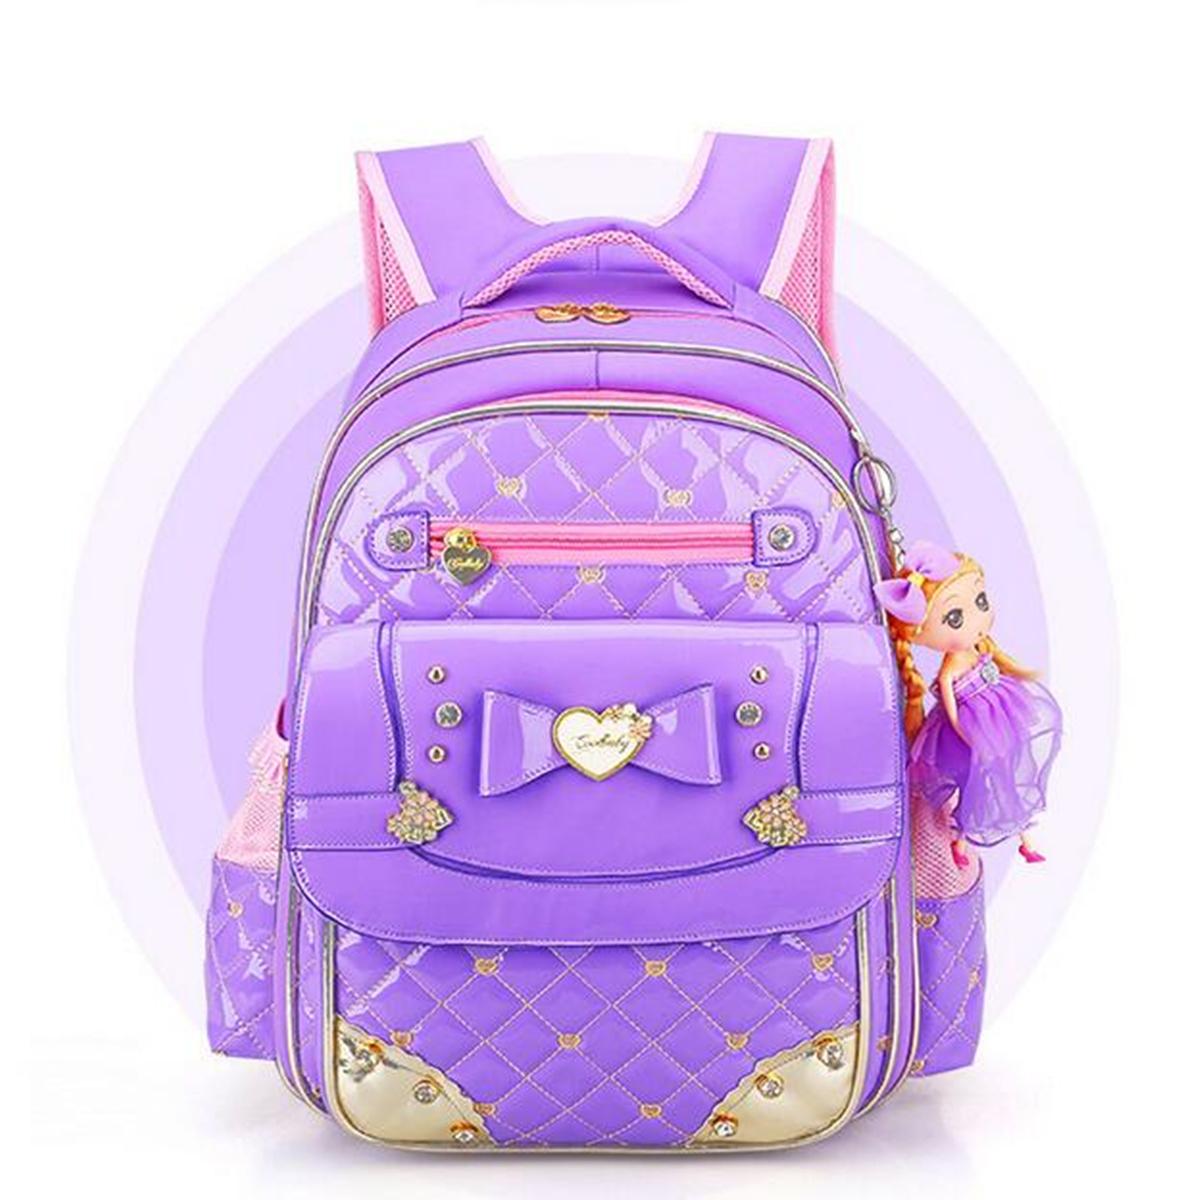 Details about Waterproof Kids Backpack Girls Boys Children Primary Student School  Bag Handbag 8a2444547d7c7